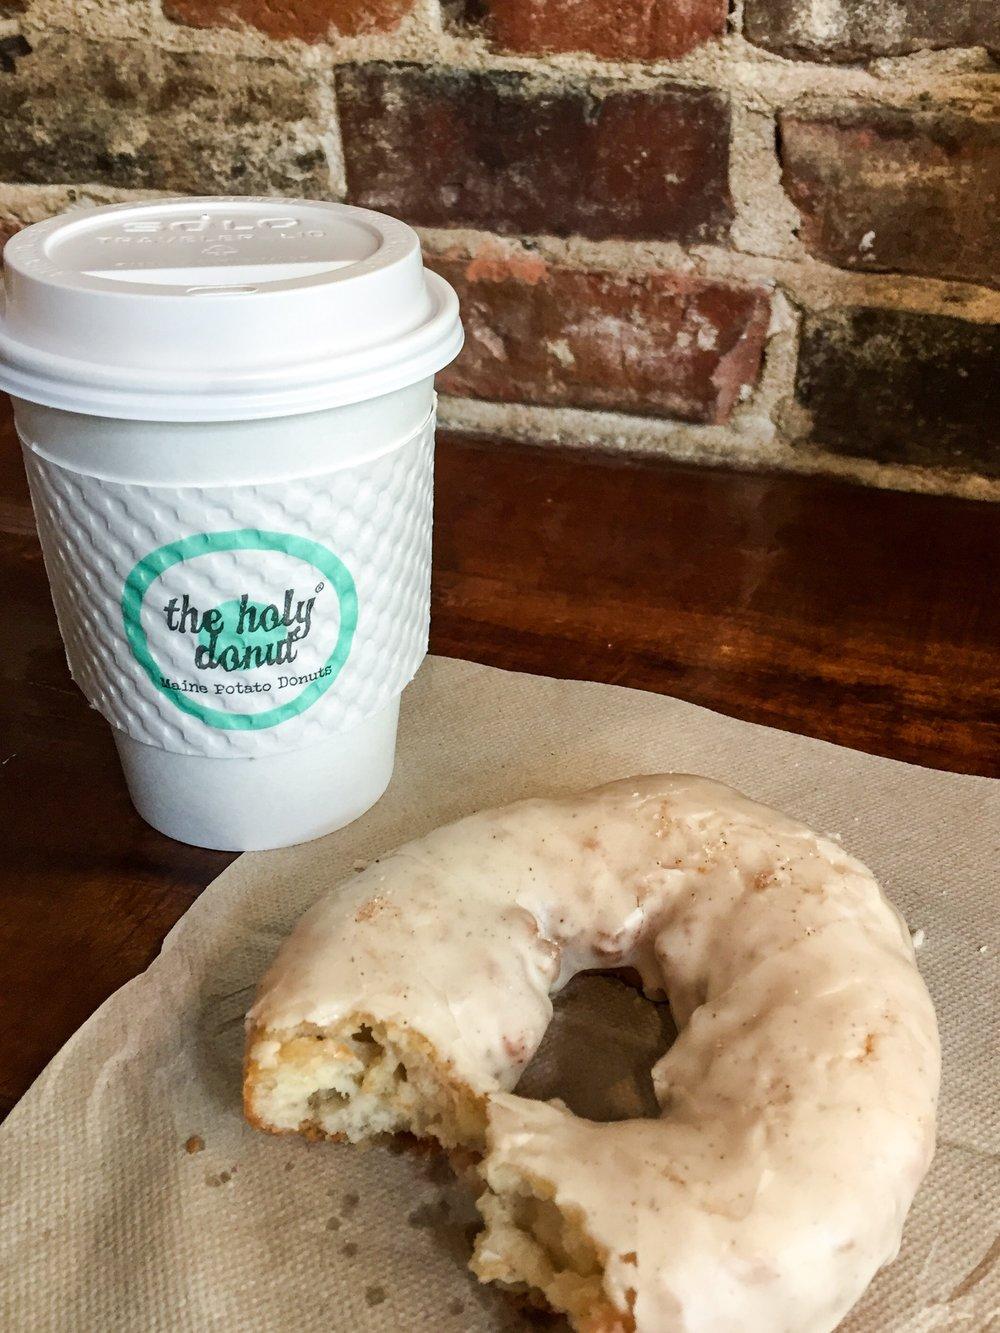 Holy doughnuts portland.JPEG